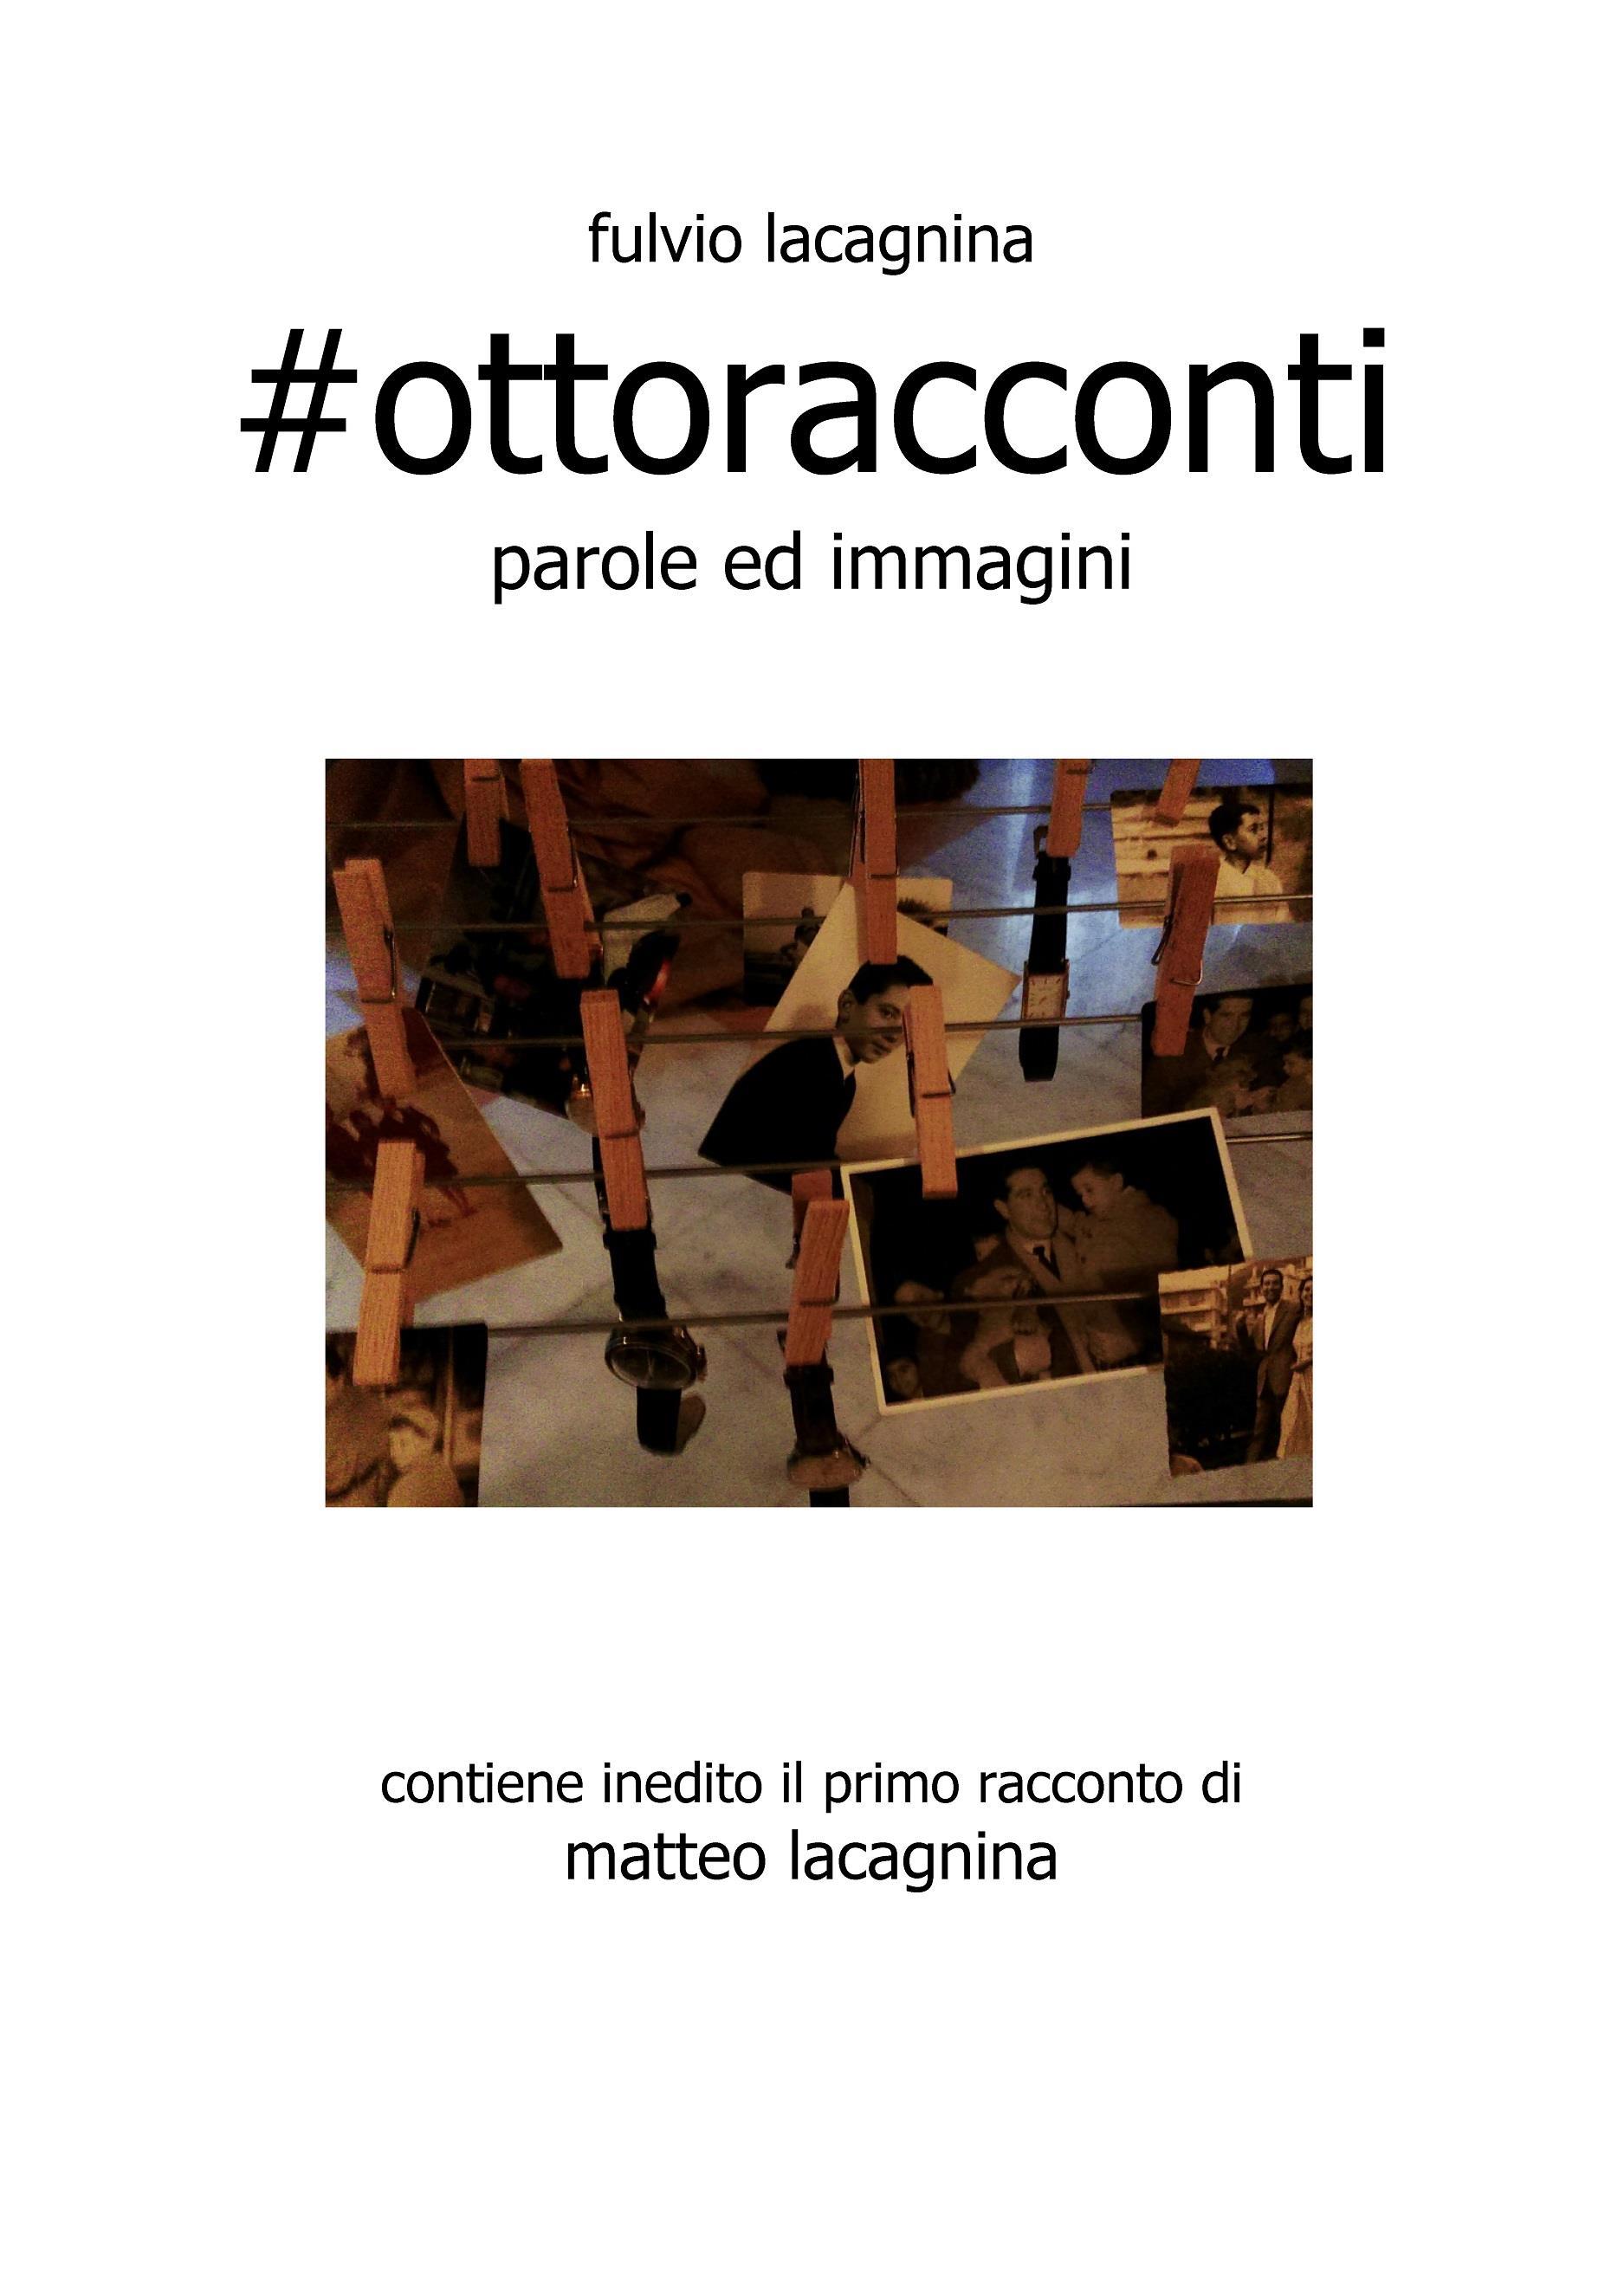 #ottoracconti